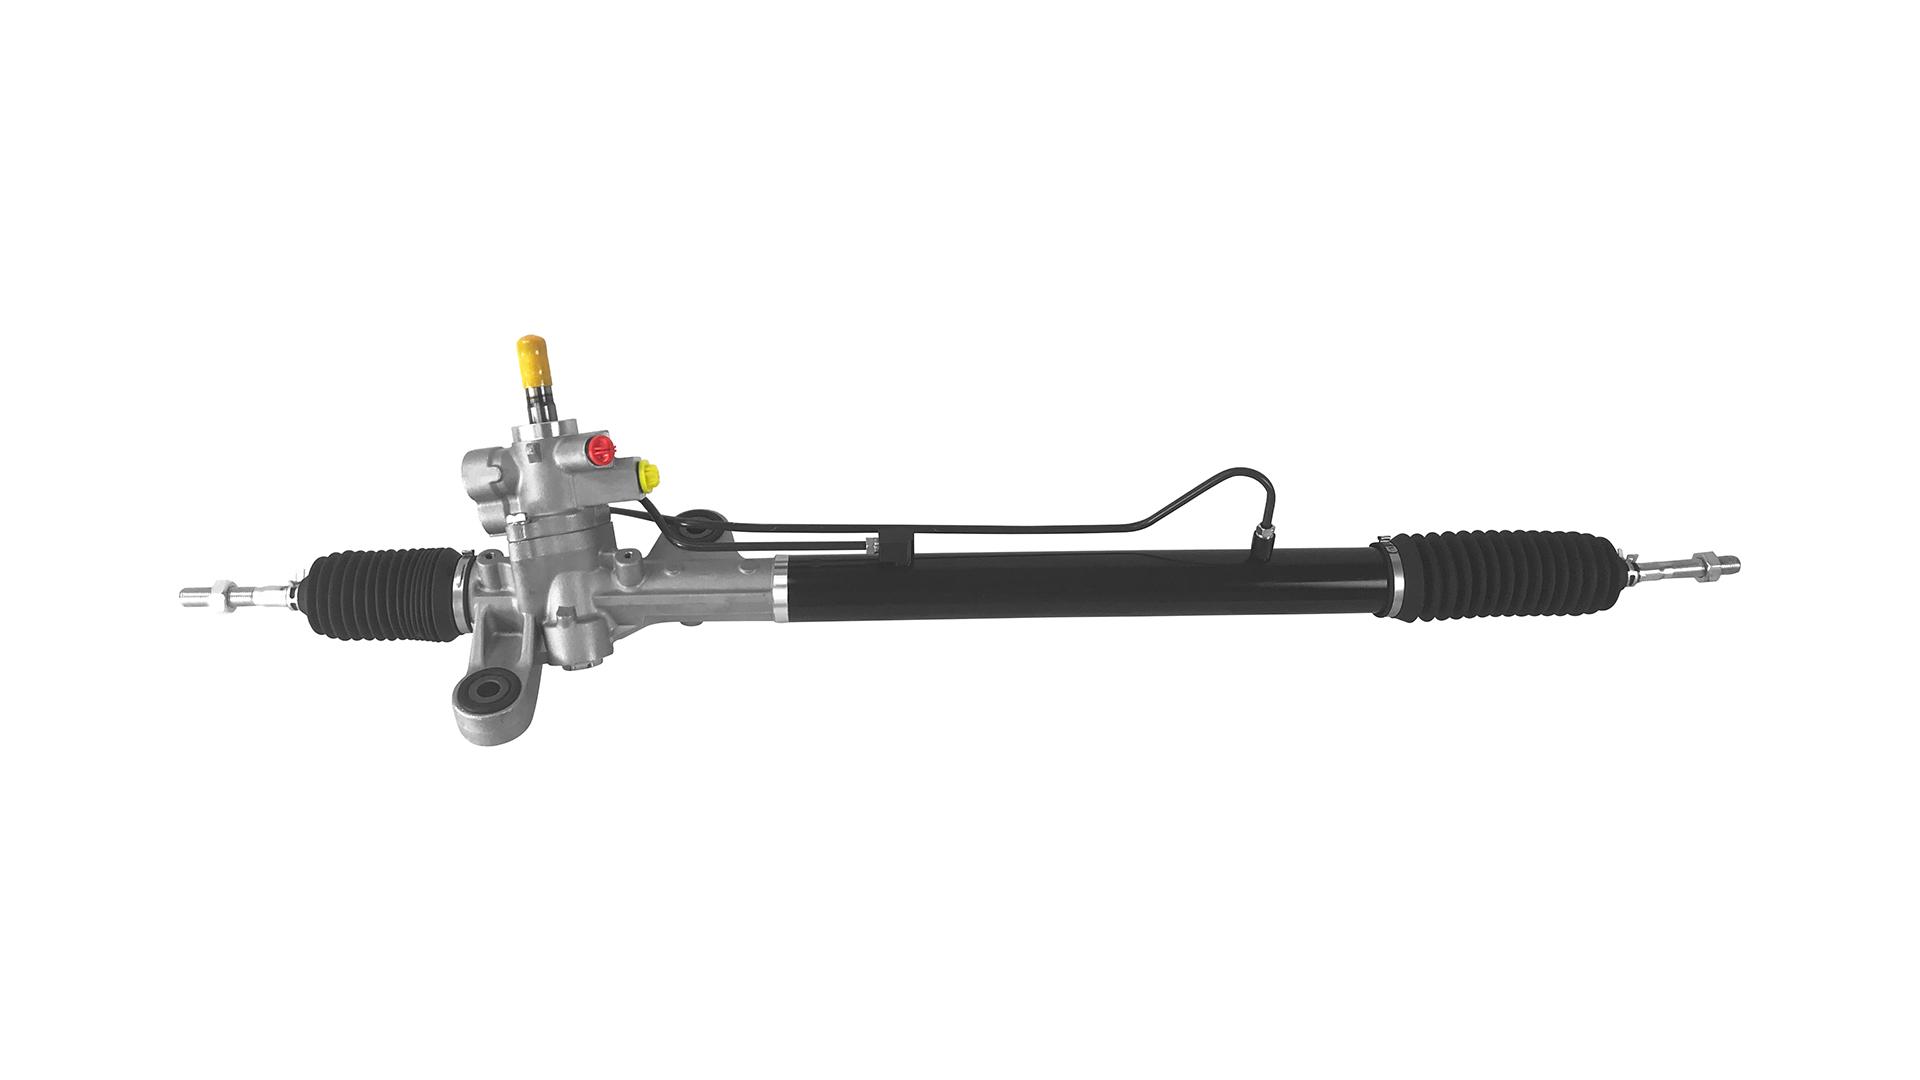 53601-TAO-003 CAR AC COMPRESSOR FOR HONDA ACCORD CP1 RHD